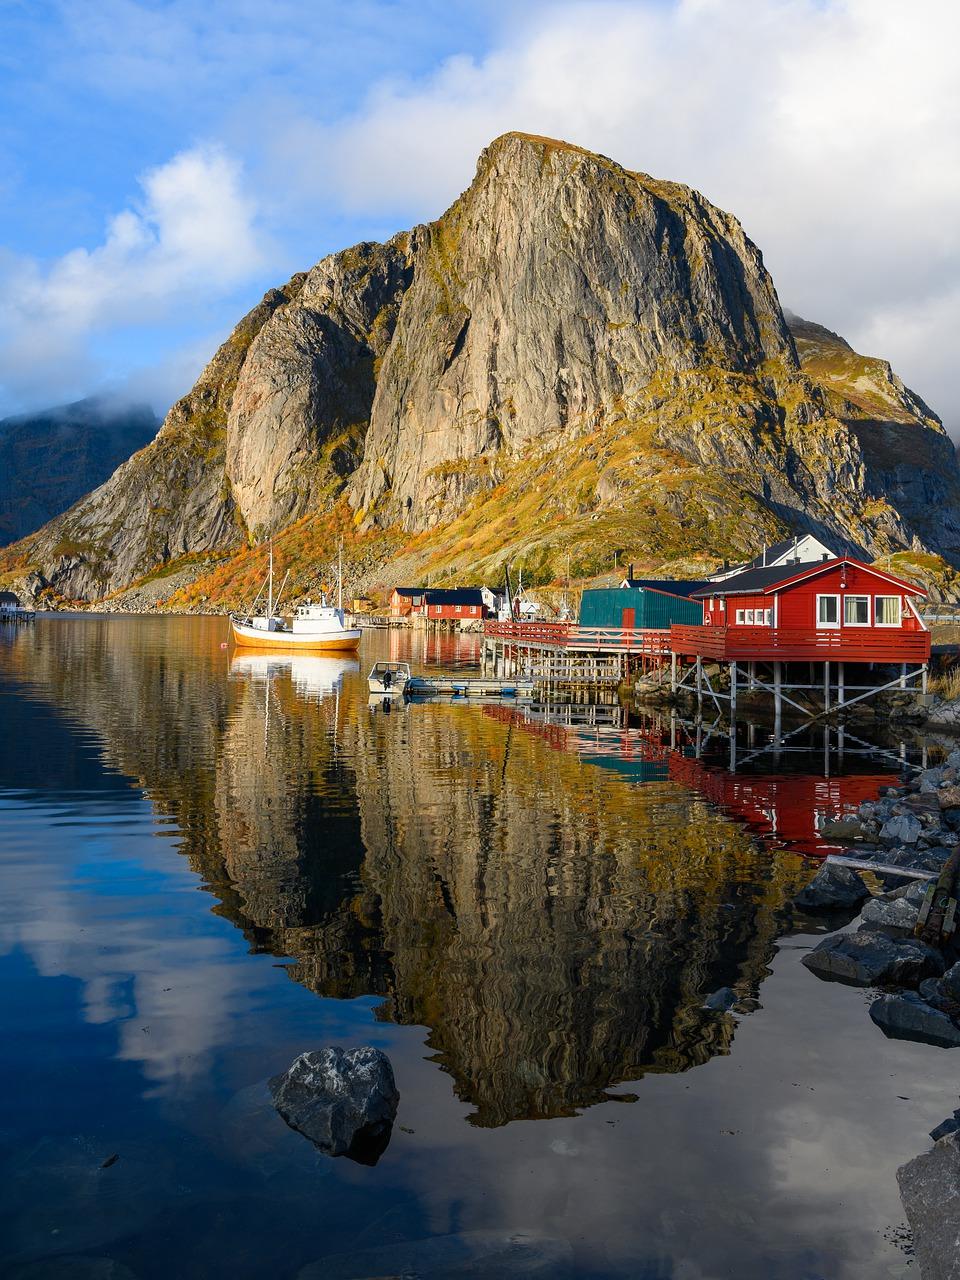 Über den Betrieb in Norwegen